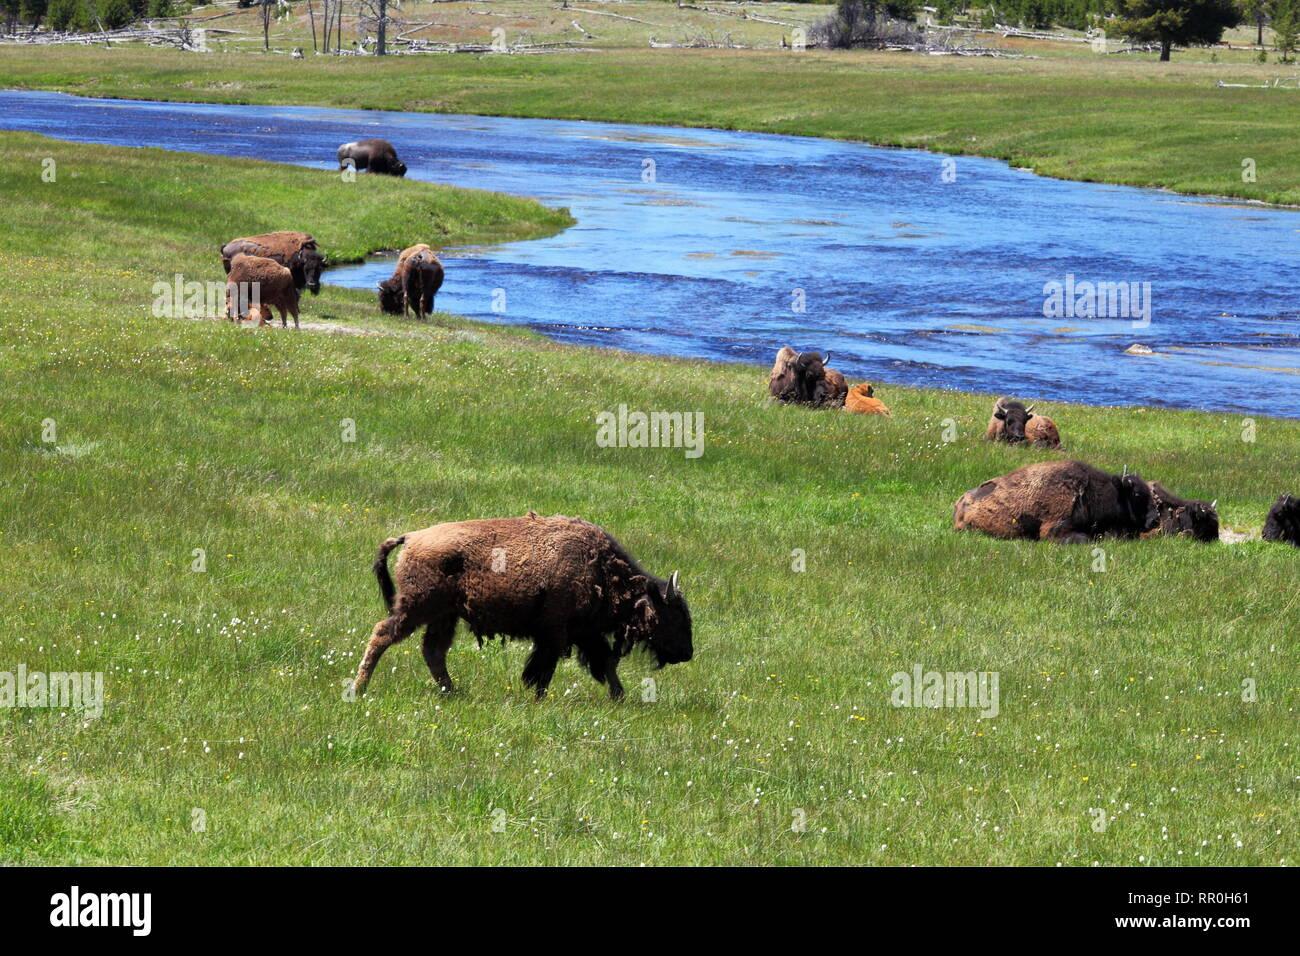 zoology / animals, mammal / mammalian (mammalia), American buffalo (Bos bison), Firehole River, Yellow, Additional-Rights-Clearance-Info-Not-Available - Stock Image